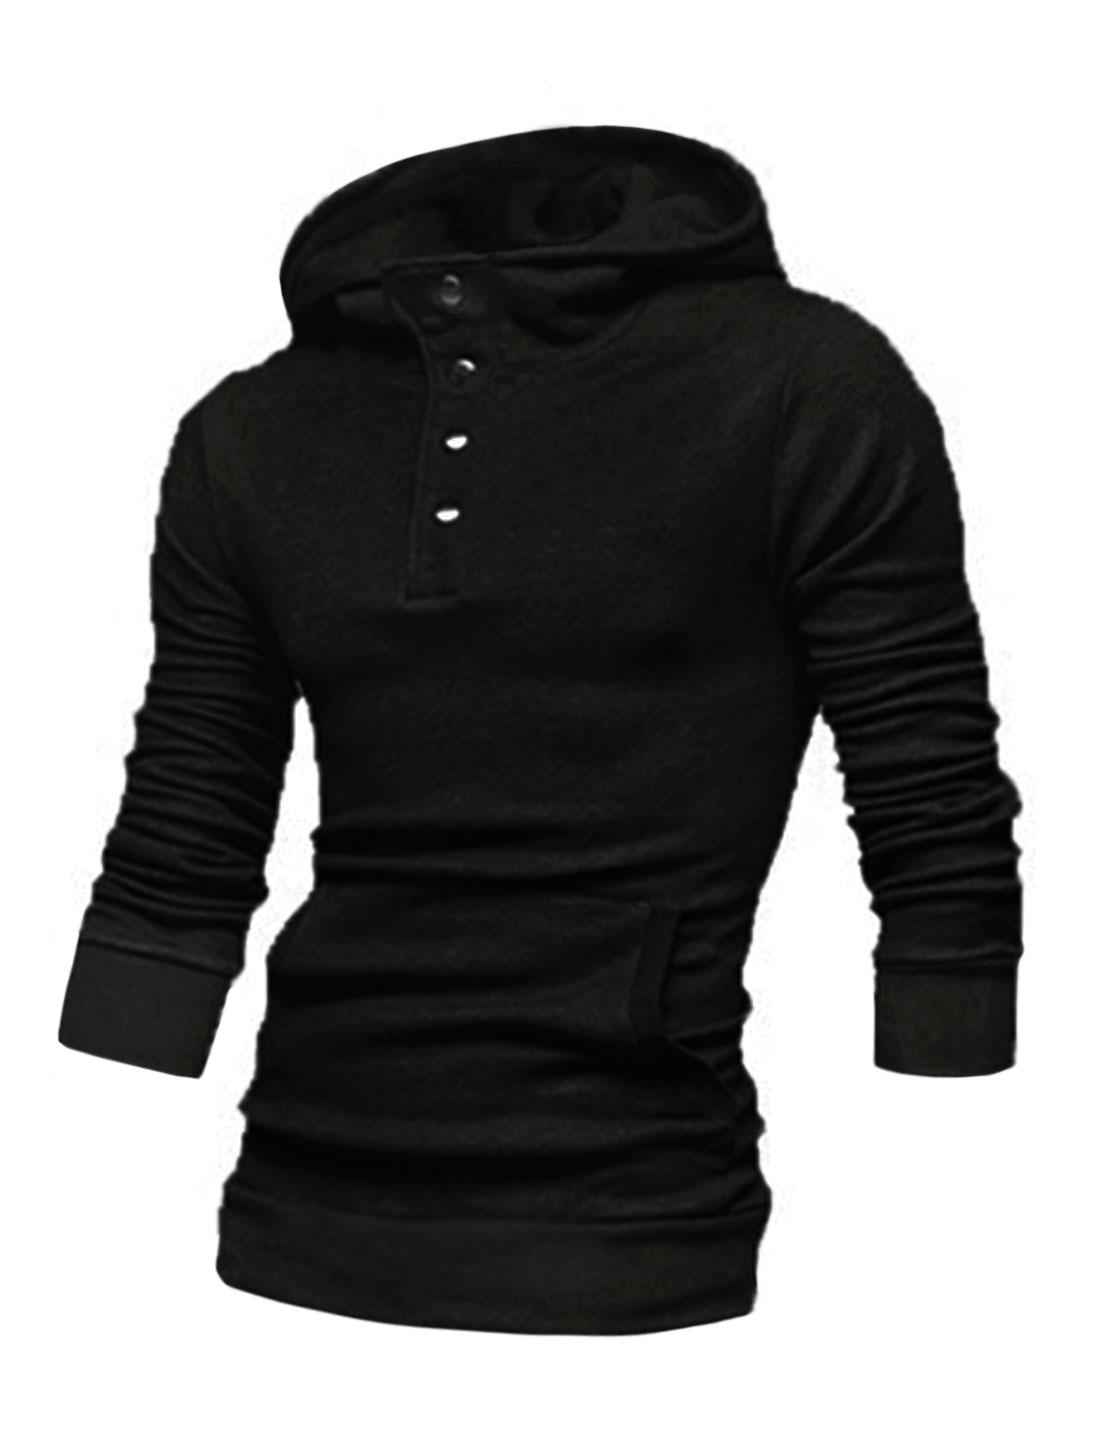 Men Long Sleeve Kangaroo Pocket Casual Hooded T-Shirt Black M